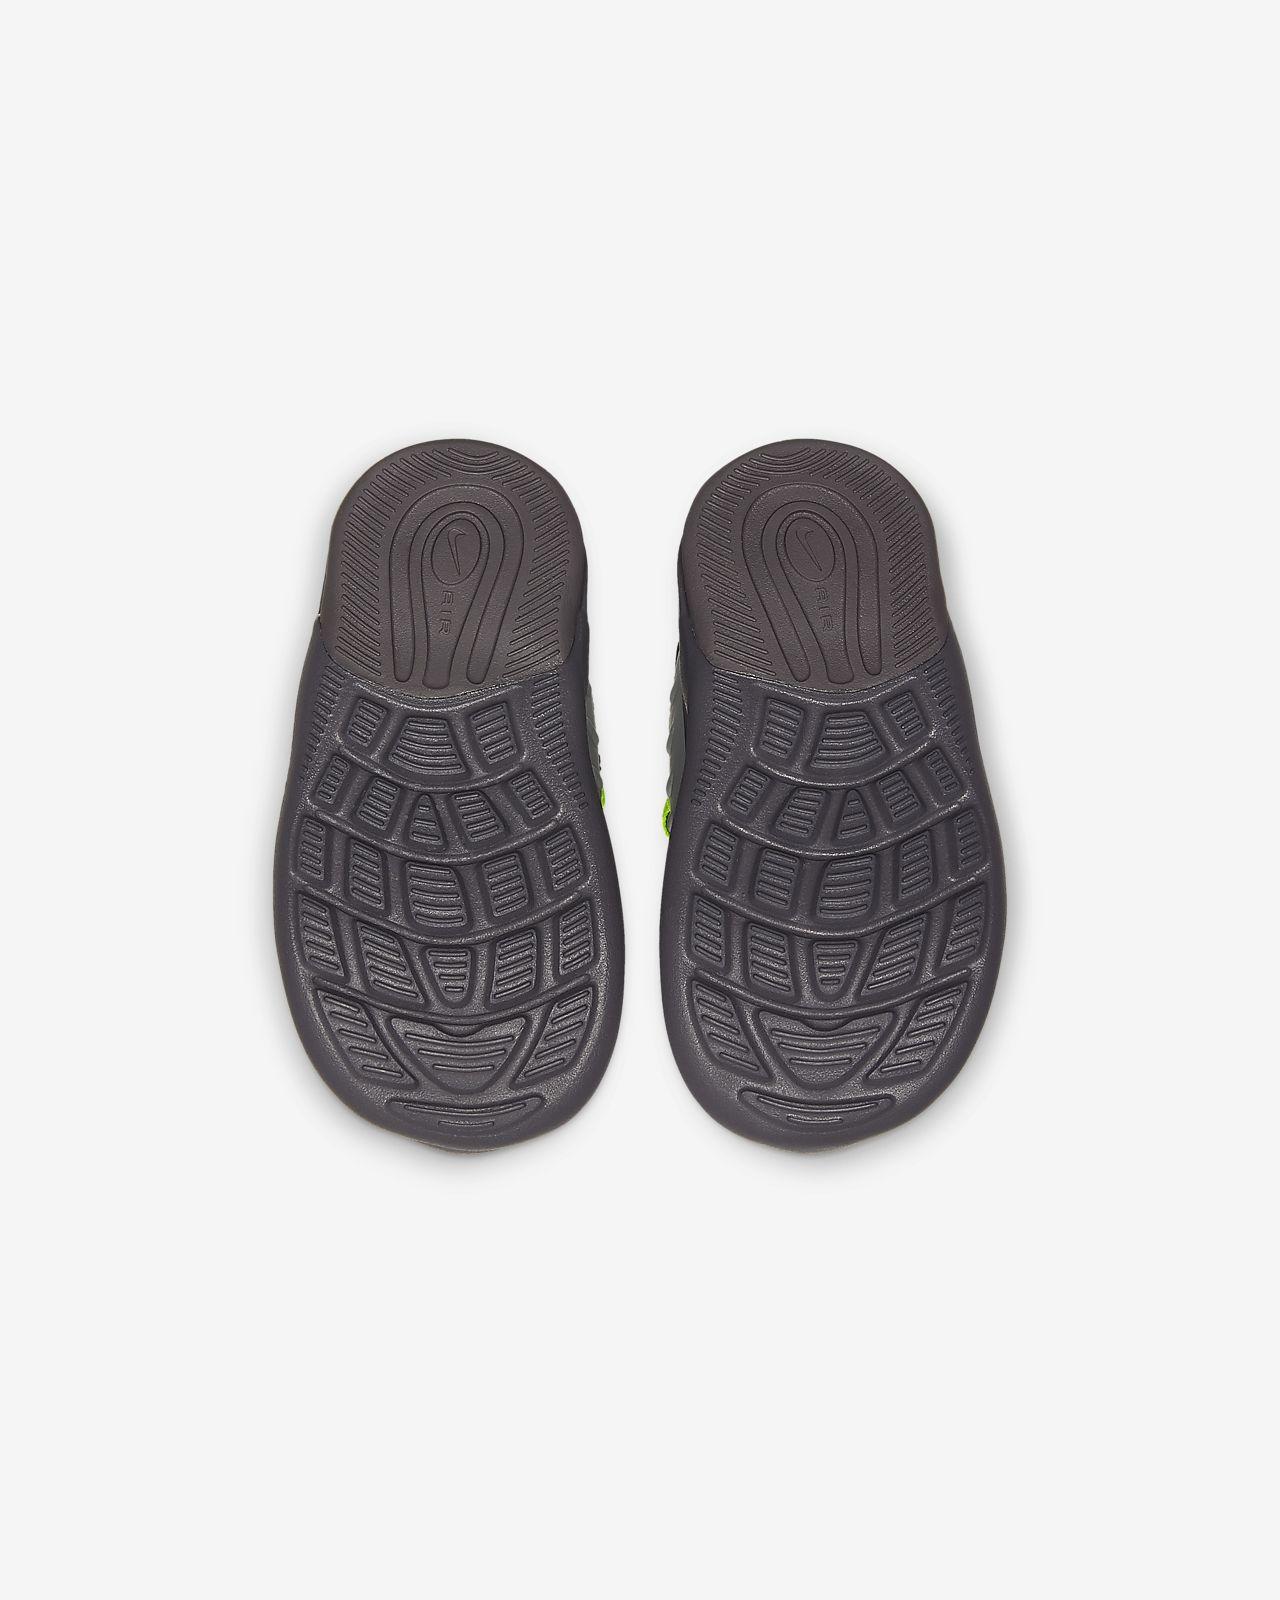 Axis Nike Shoe Max BabyToddler Air BordexWC